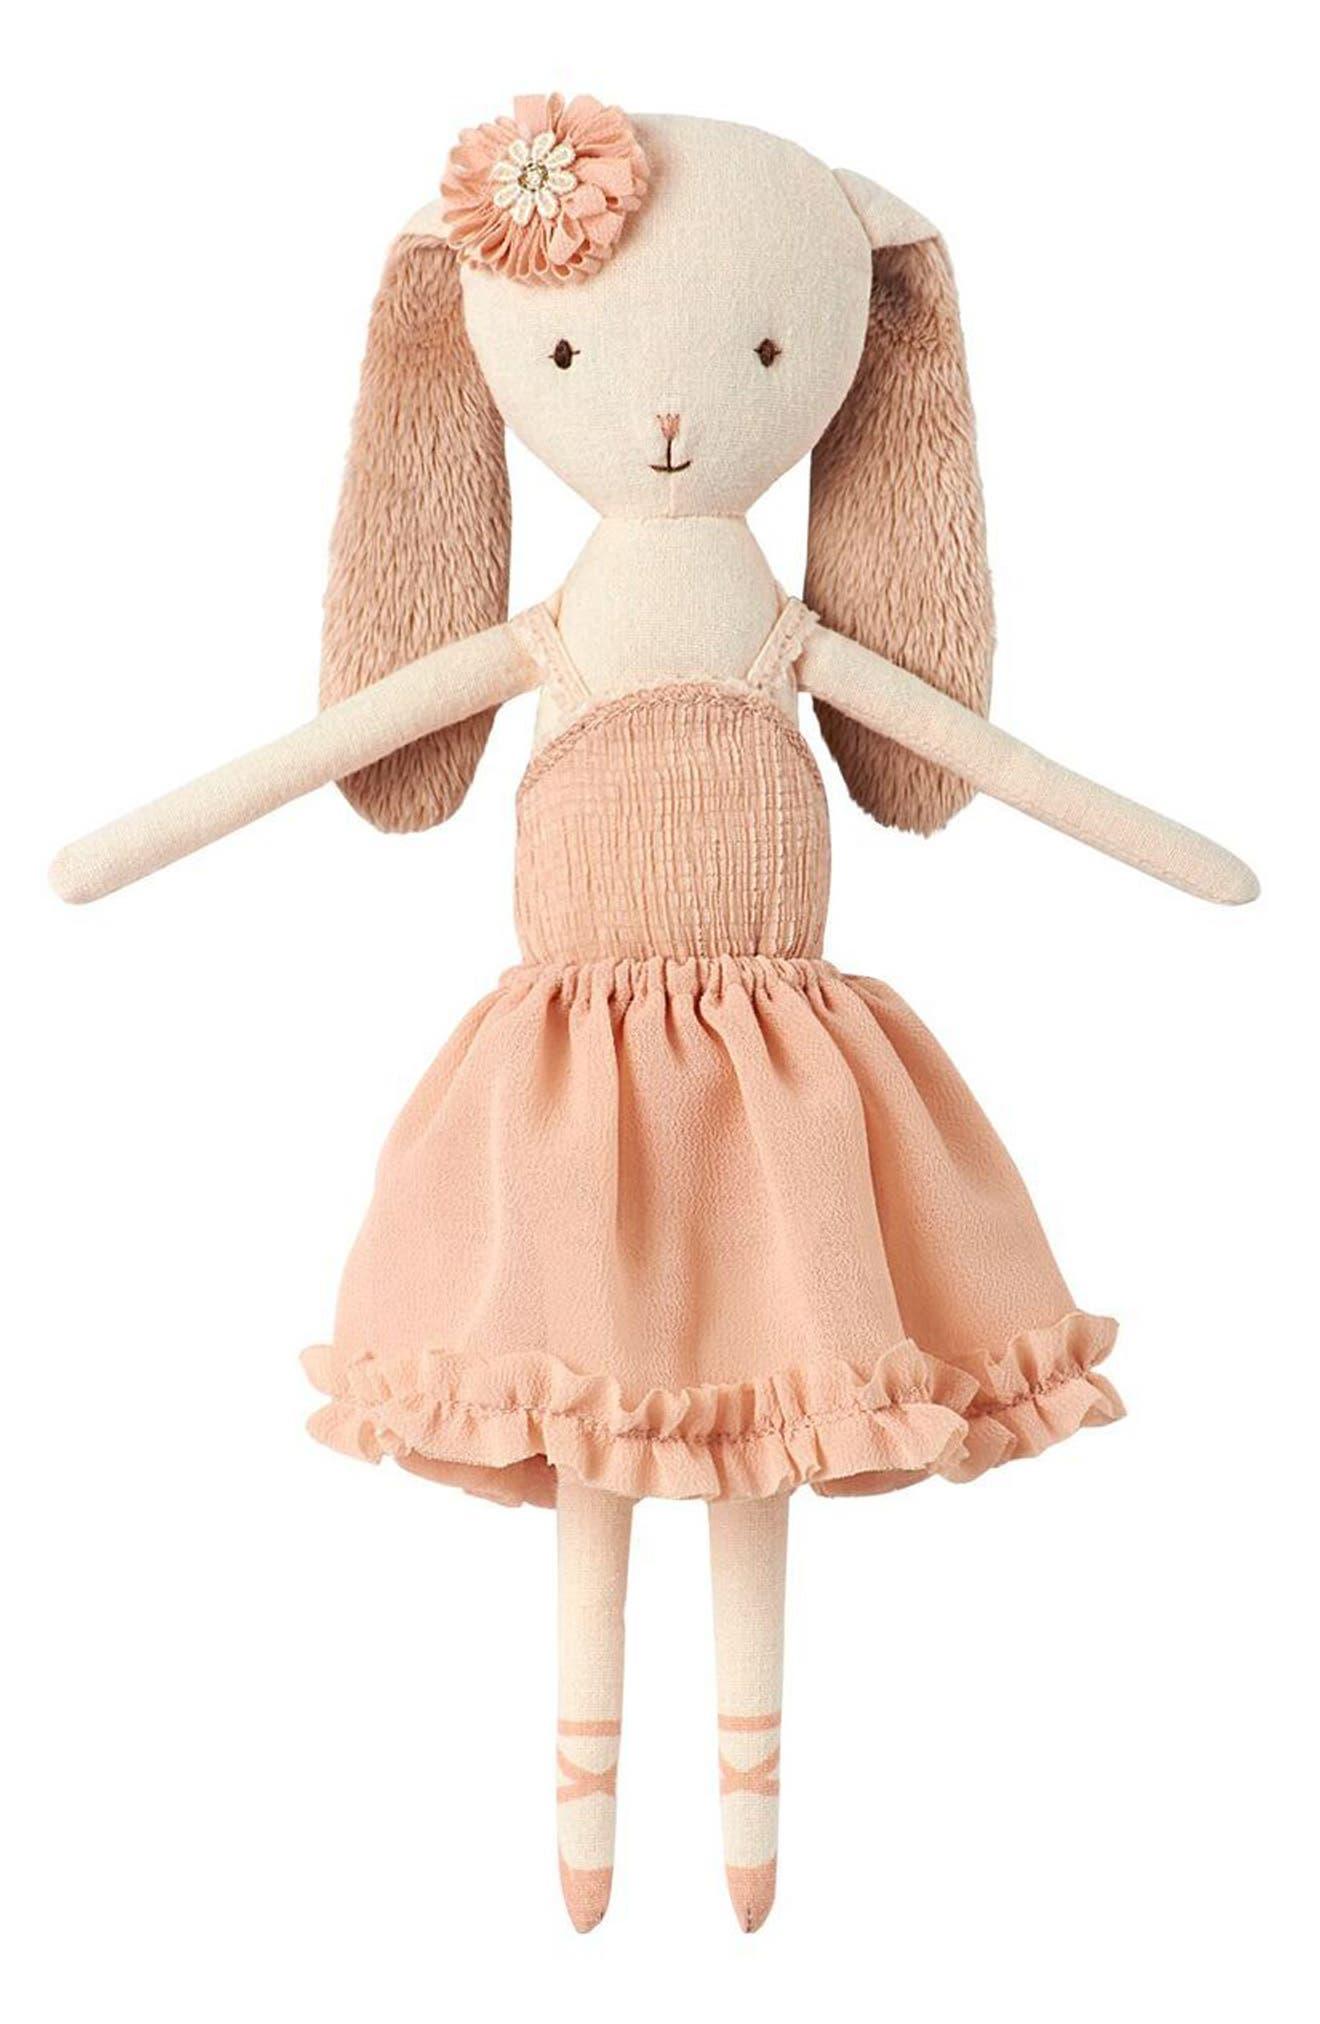 Maileg Dancing Bunny Stuffed Animal